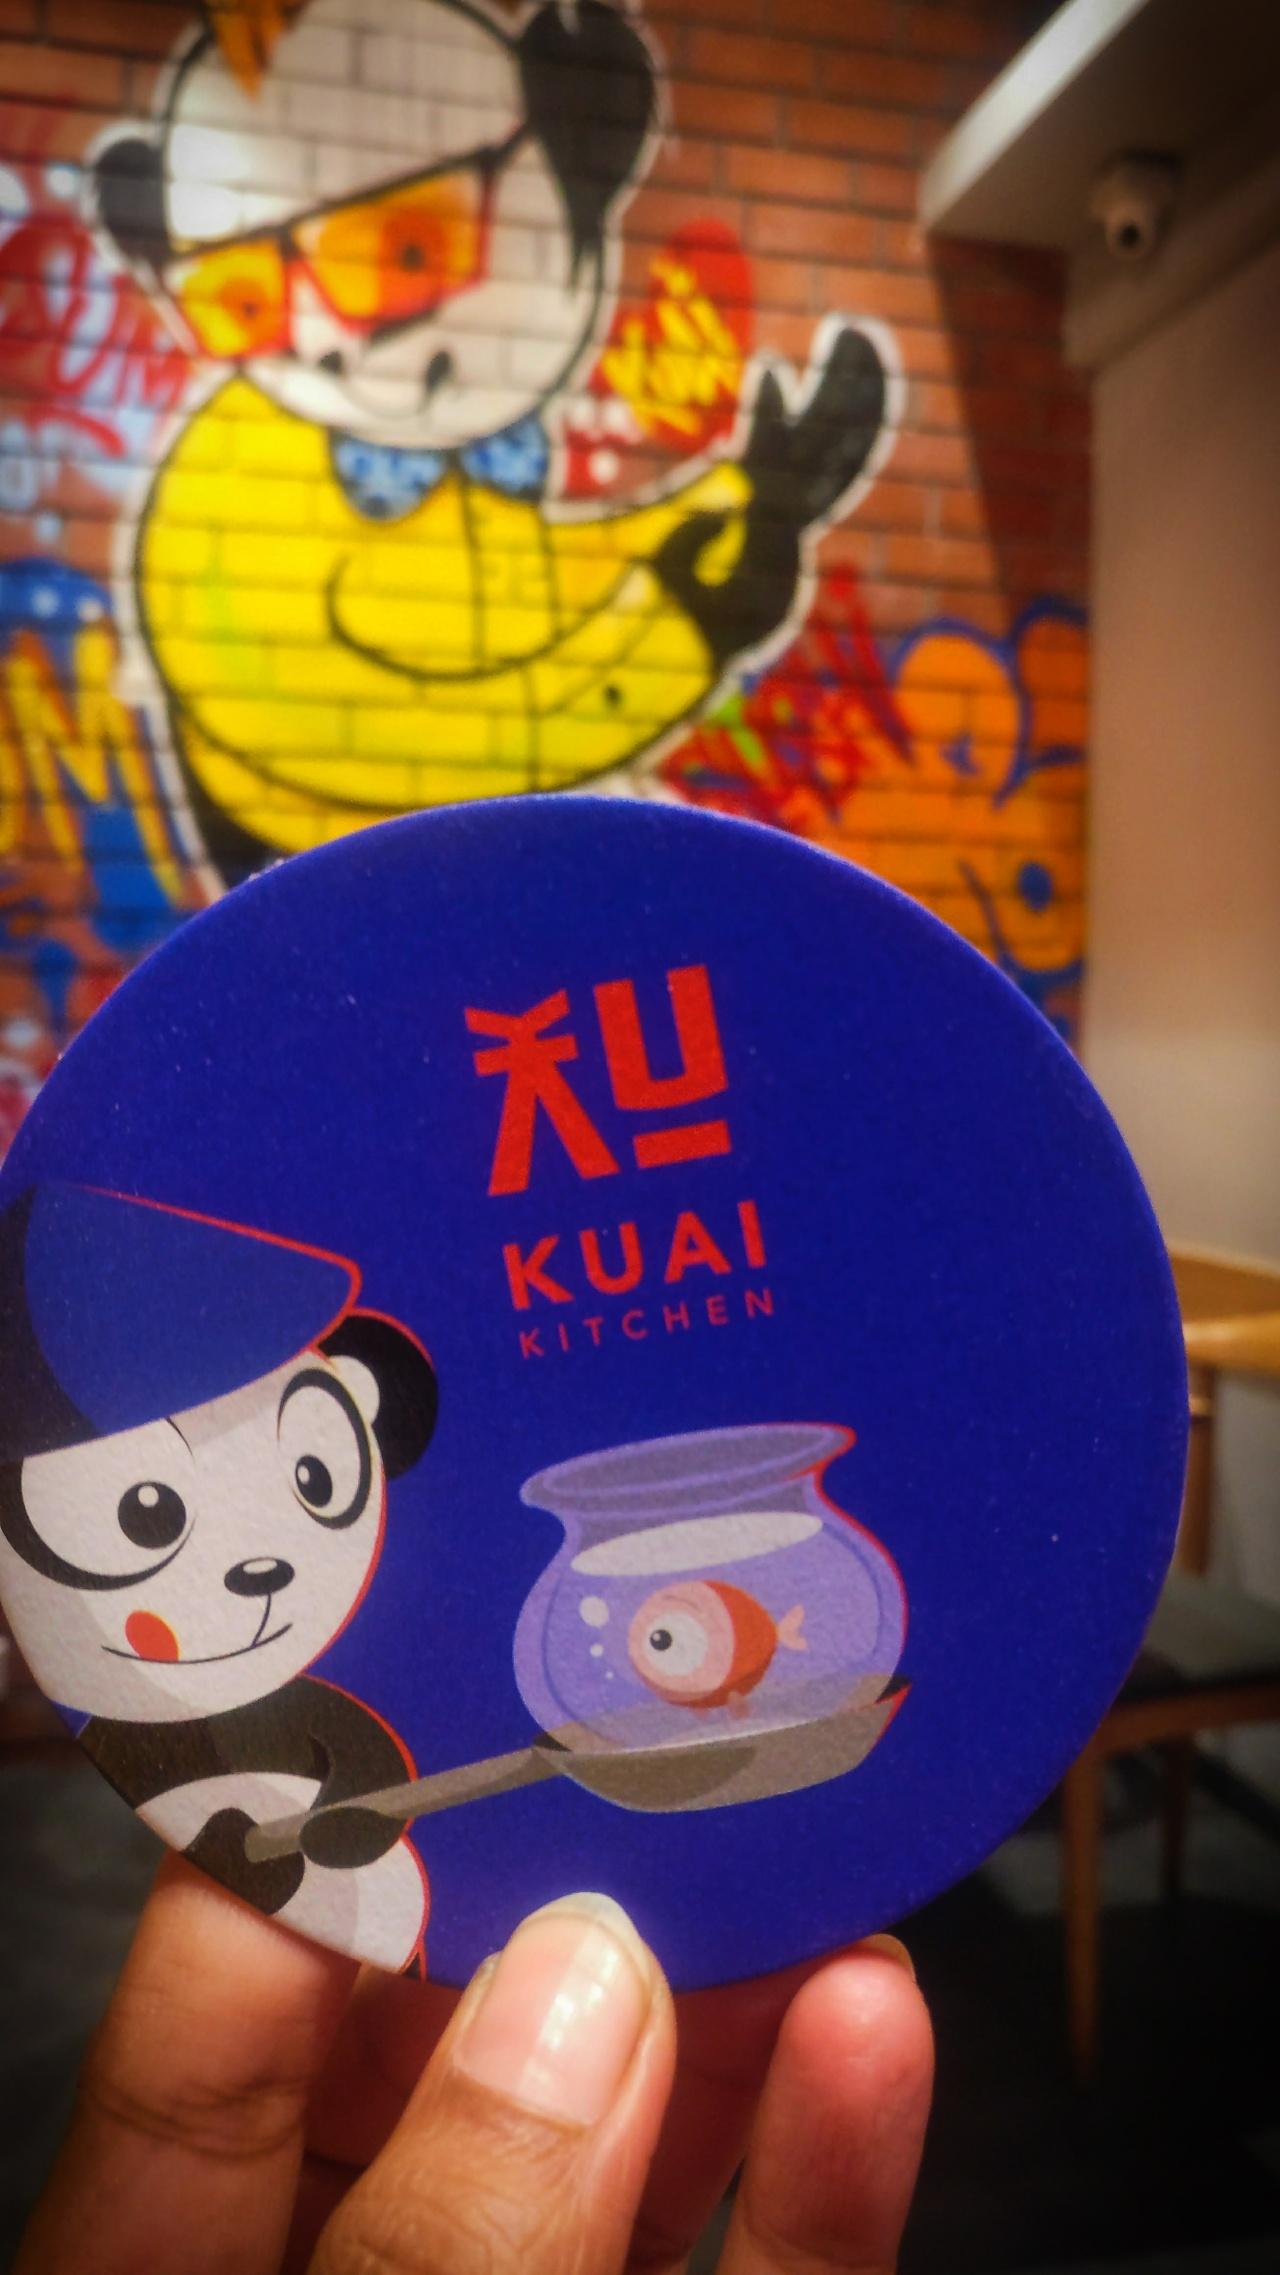 Sushi that is Pocket Friendly @ KUAIKitchen